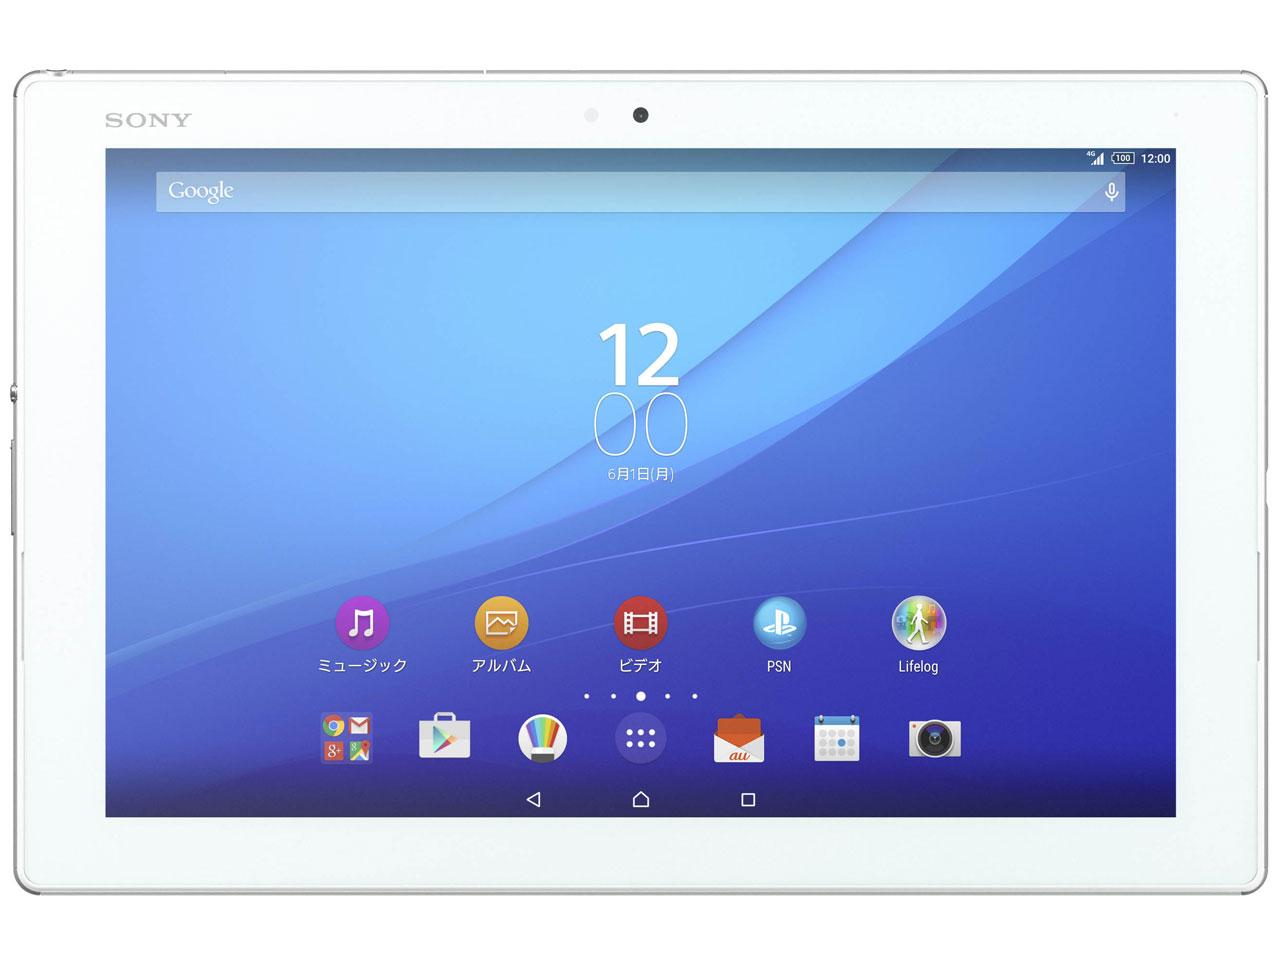 Xperia Z4 Tablet SOT31 au [ホワイト] の製品画像